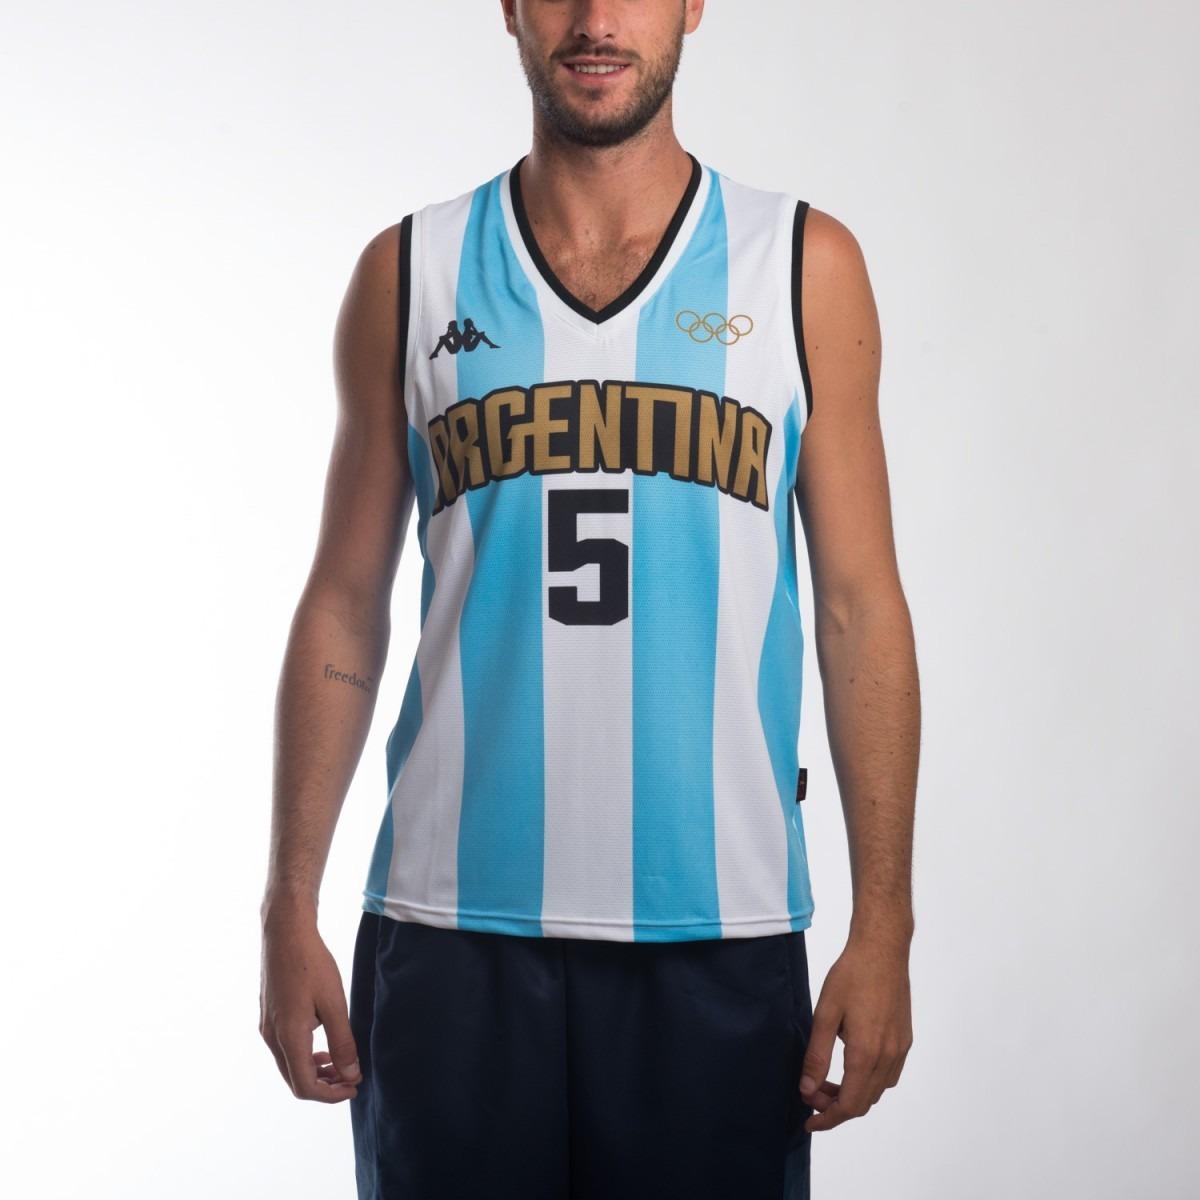 0438171a657c4 camiseta argentina basquet kappa rio 2016 manu ginobili. Cargando zoom.